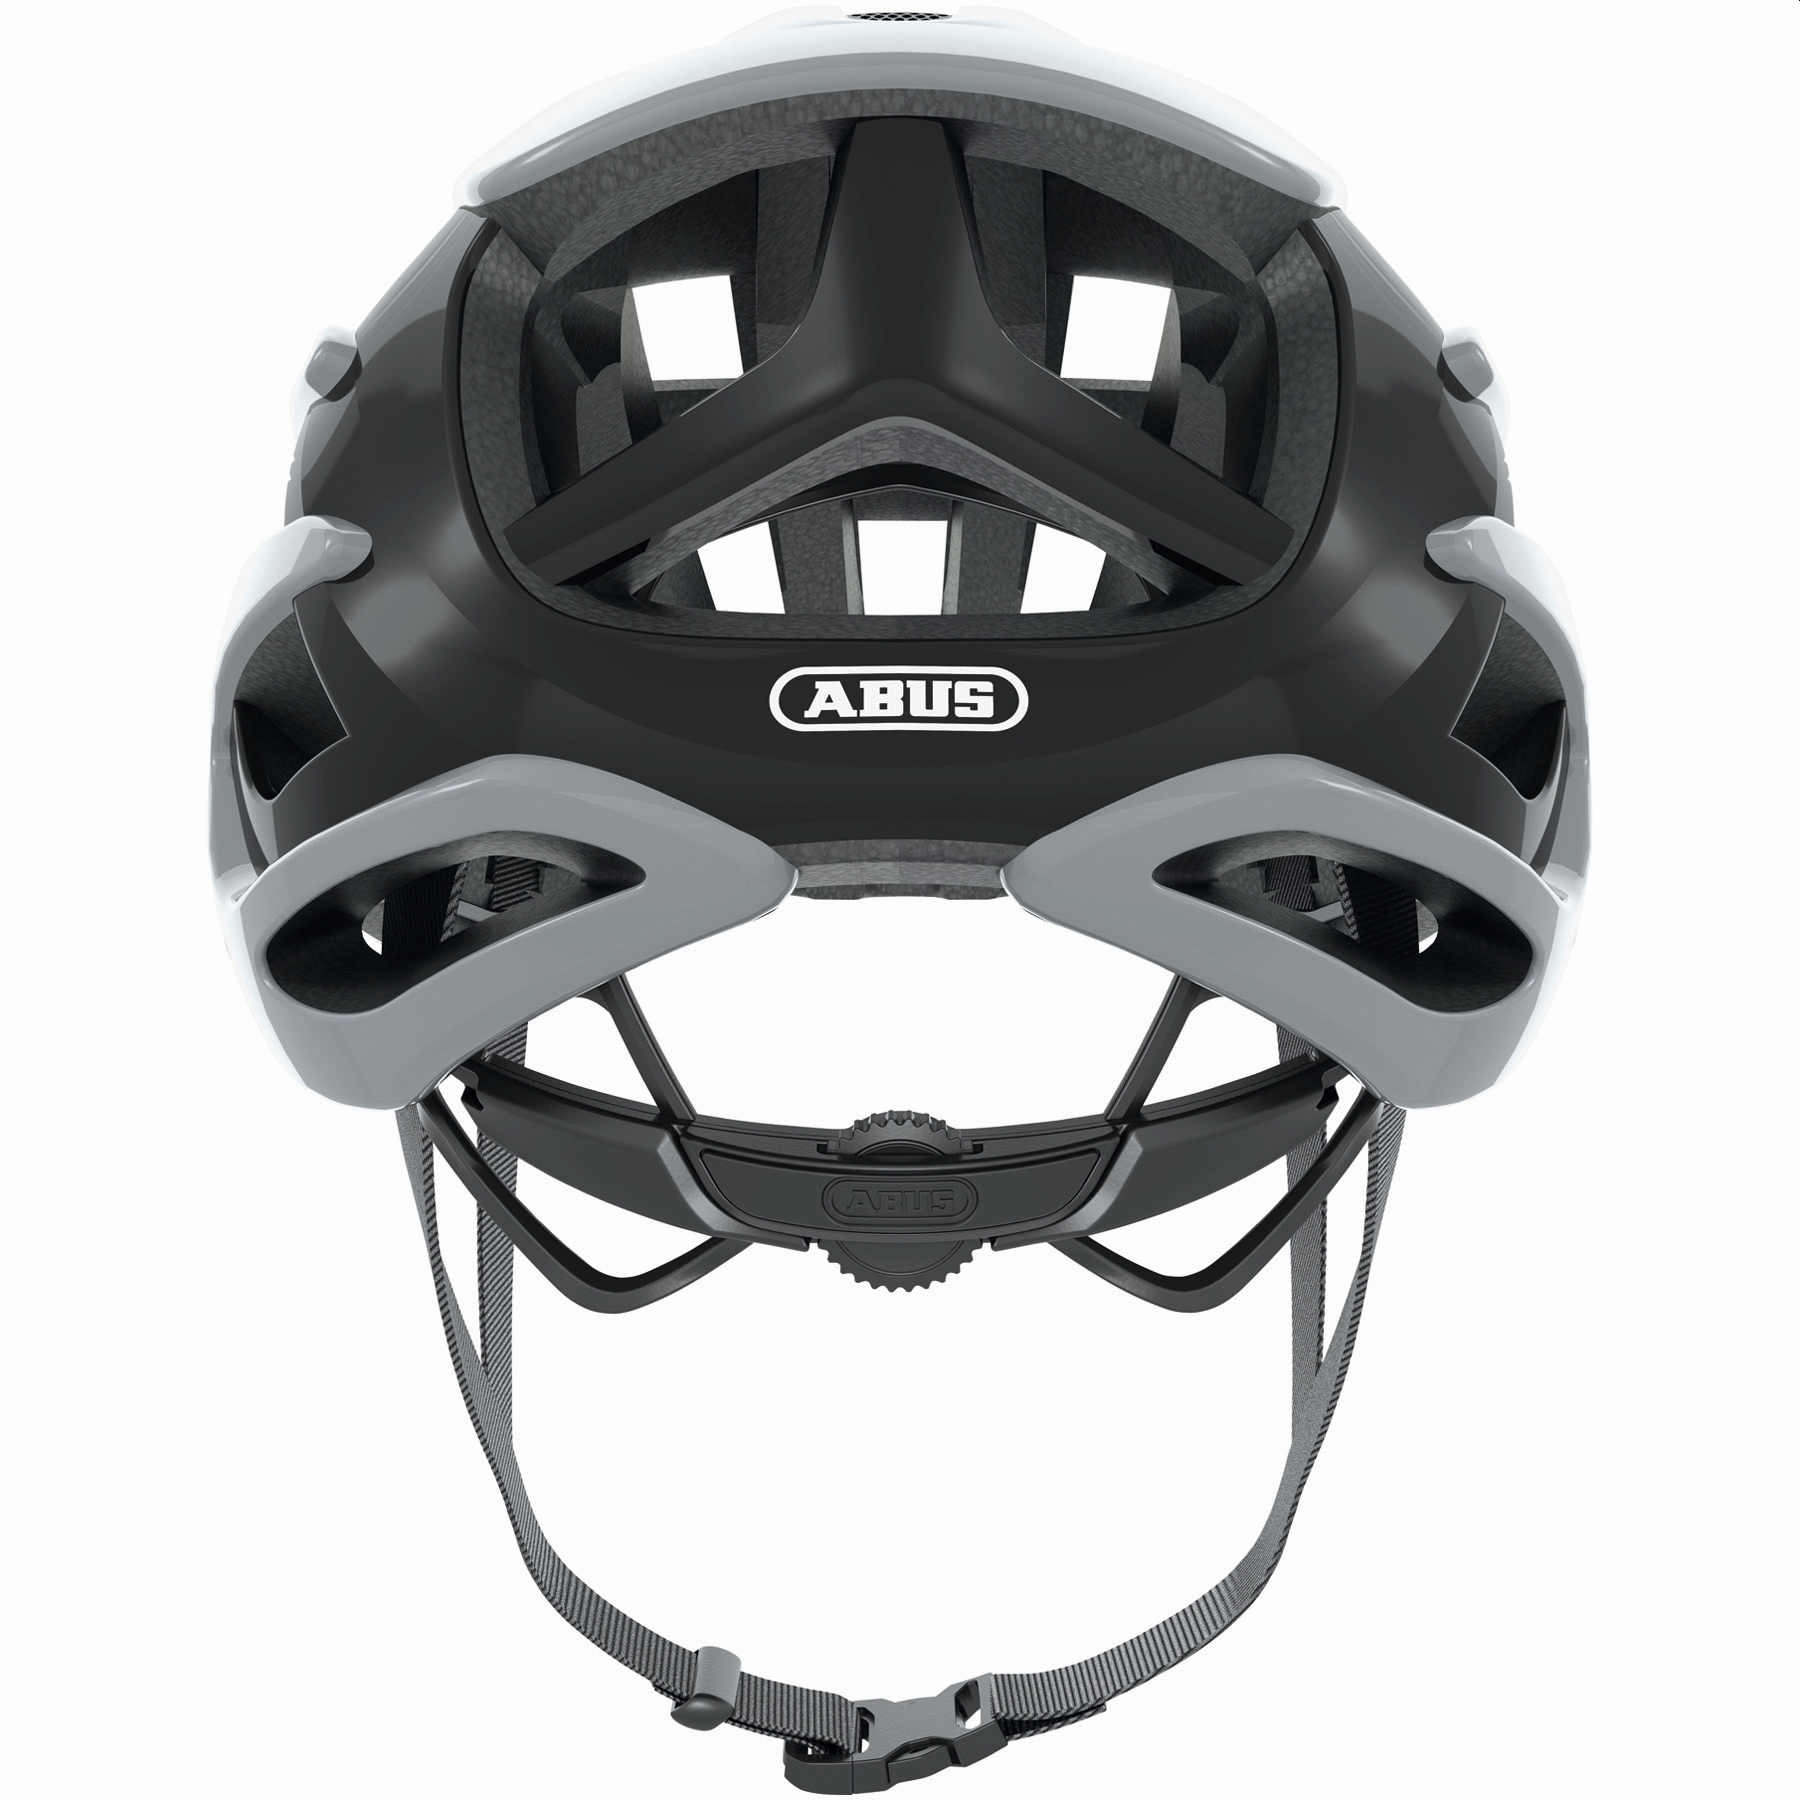 Imagen de ABUS AirBreaker Casco de Bicicleta - race grey